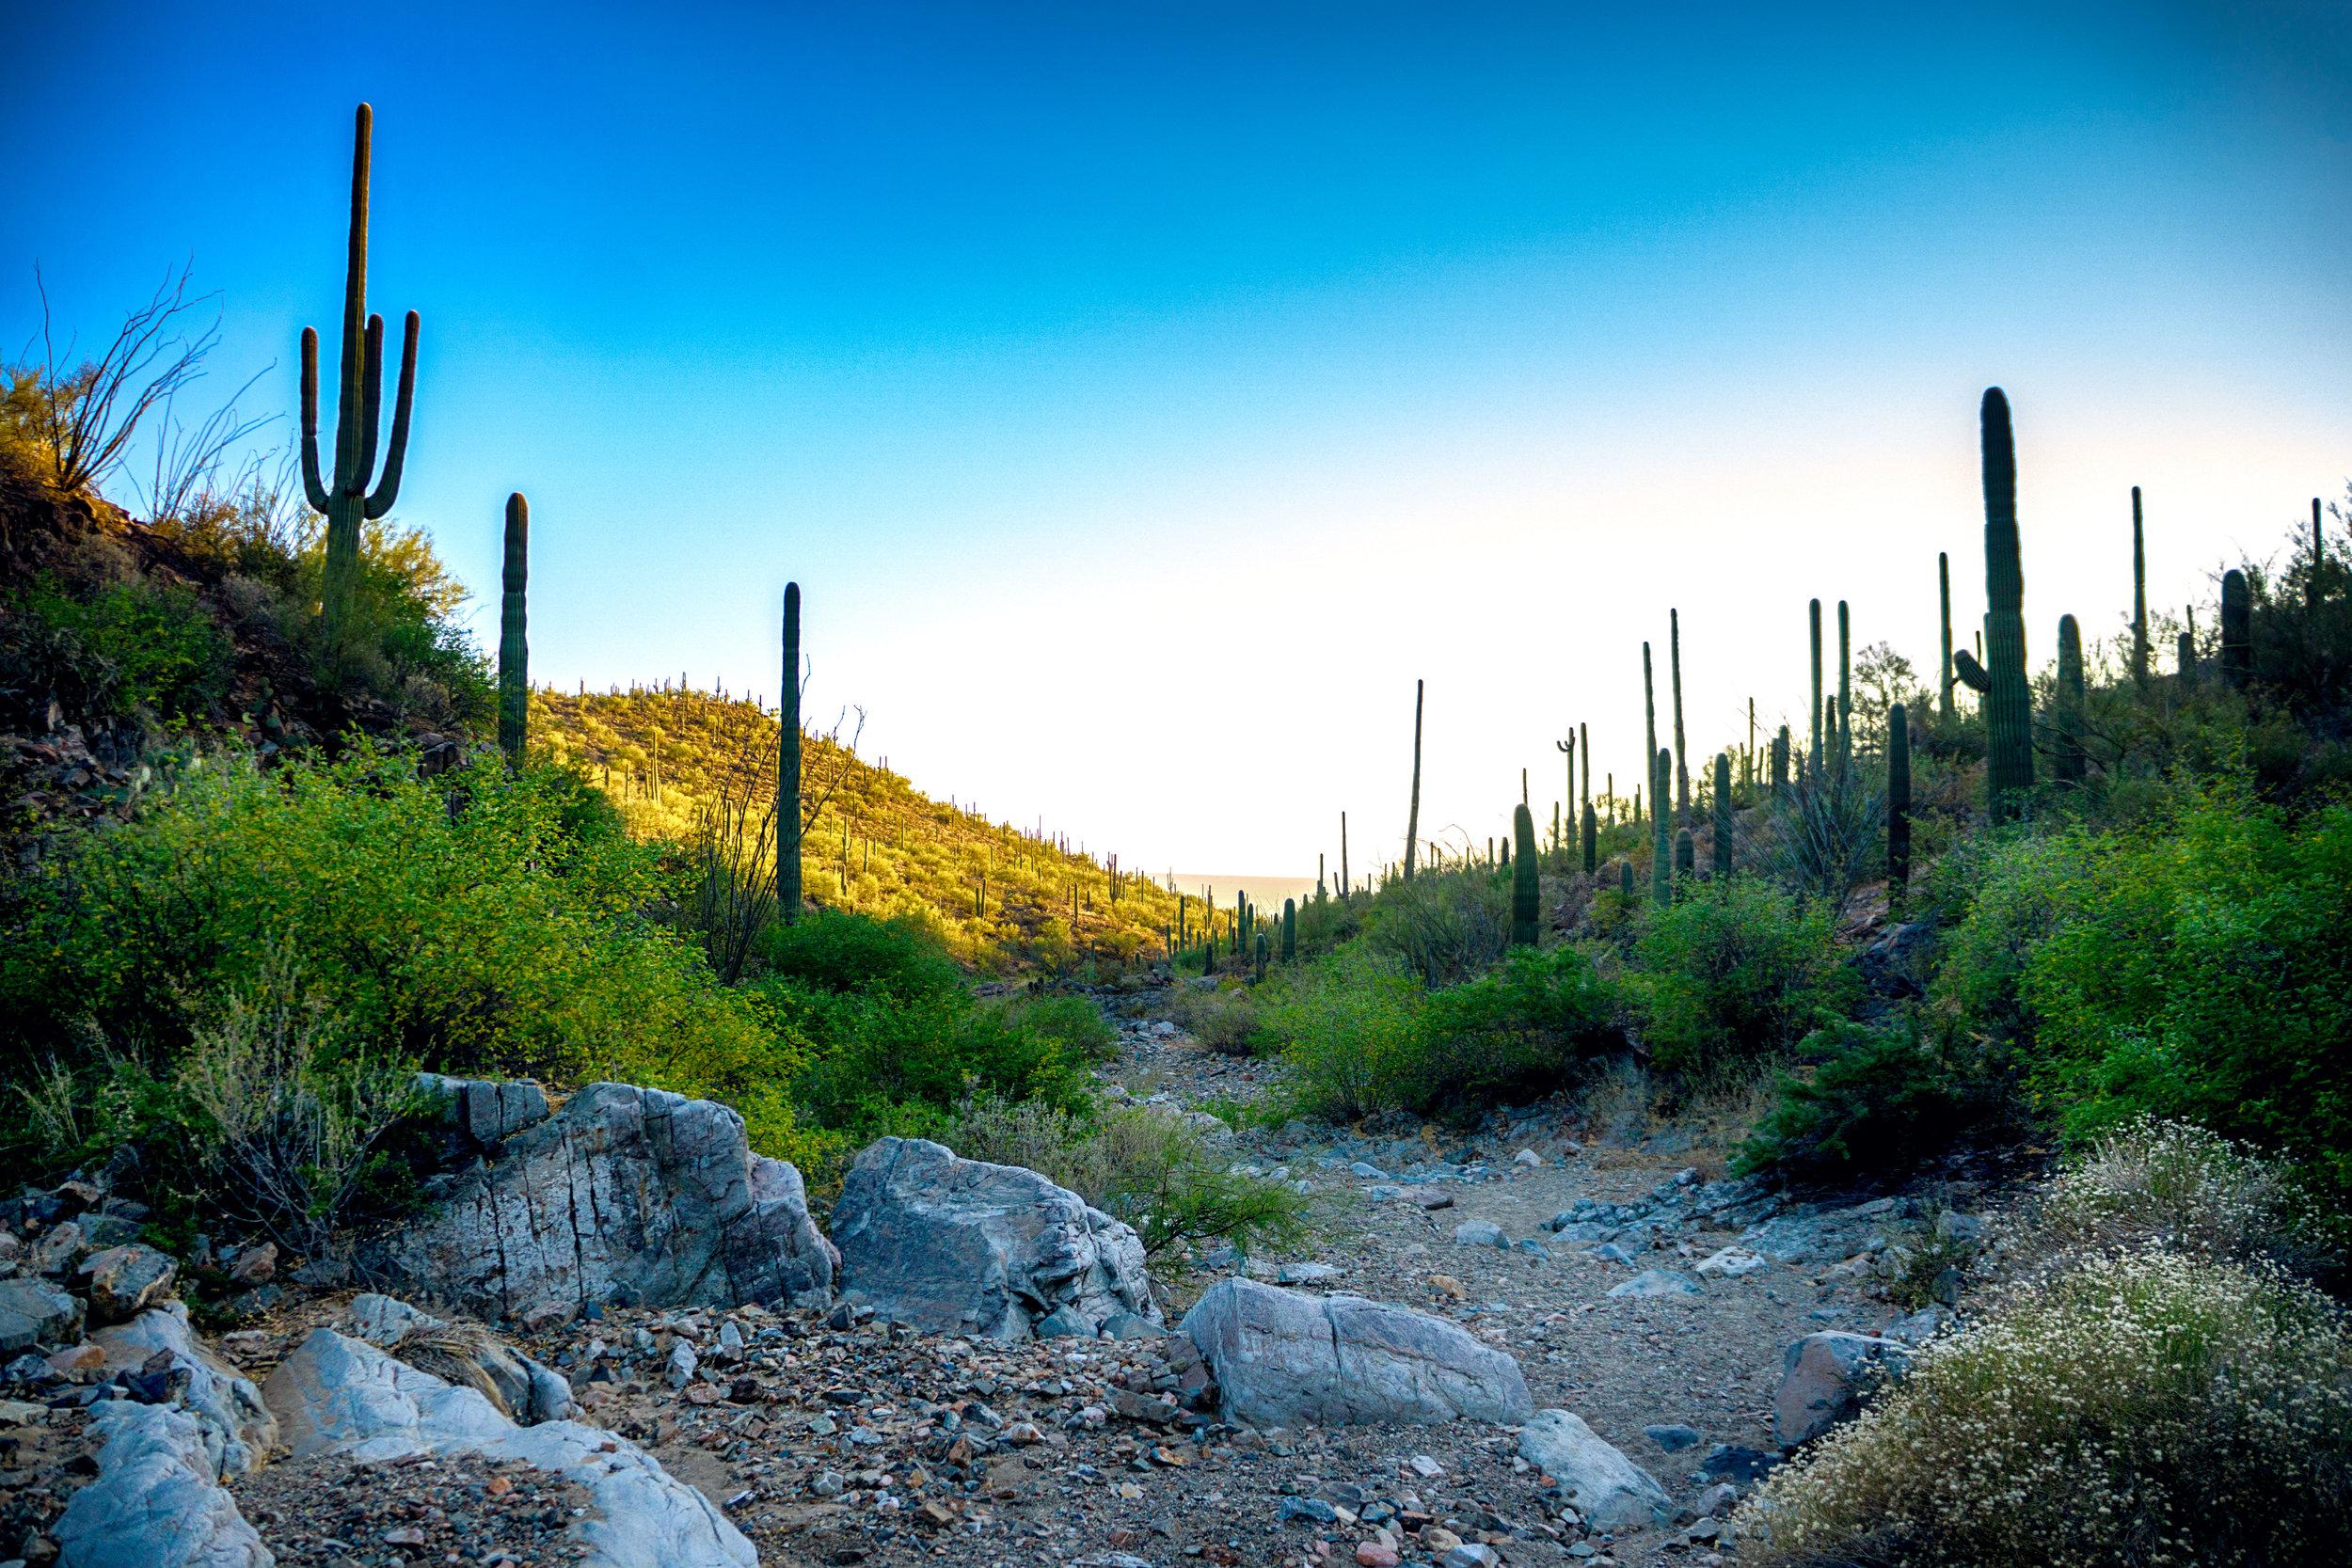 vickygood_photography_nature_saguaro-park2.jpg